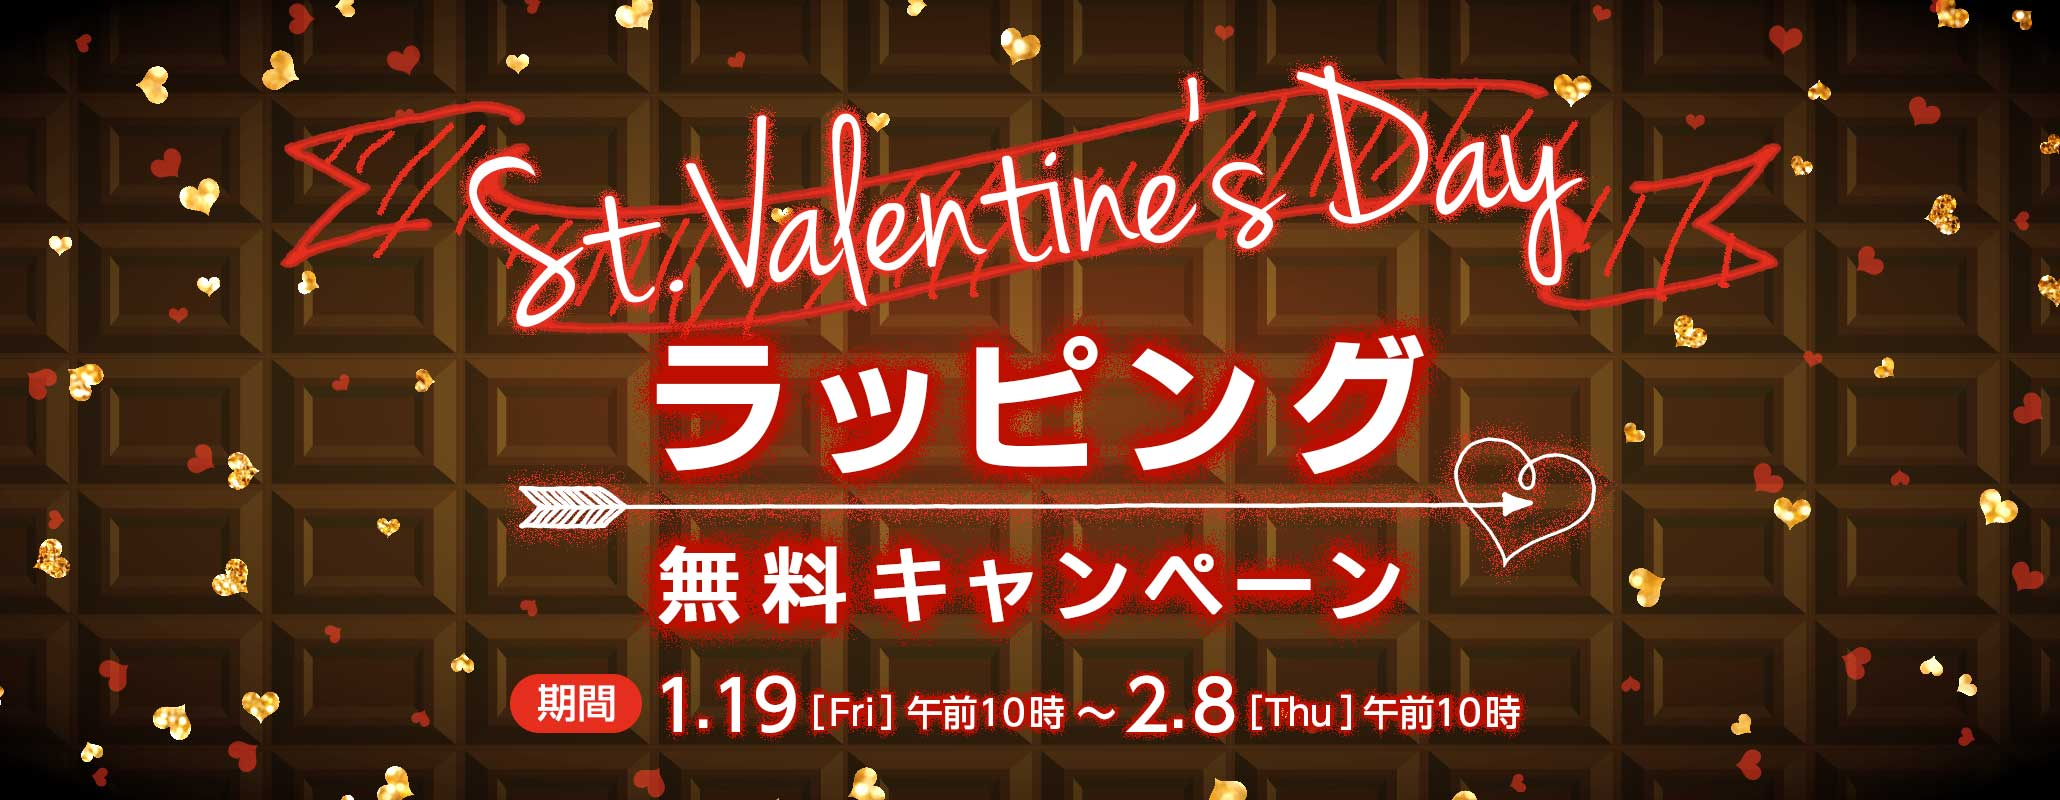 St.Valentine's Day ラッピング無料キャンペーン